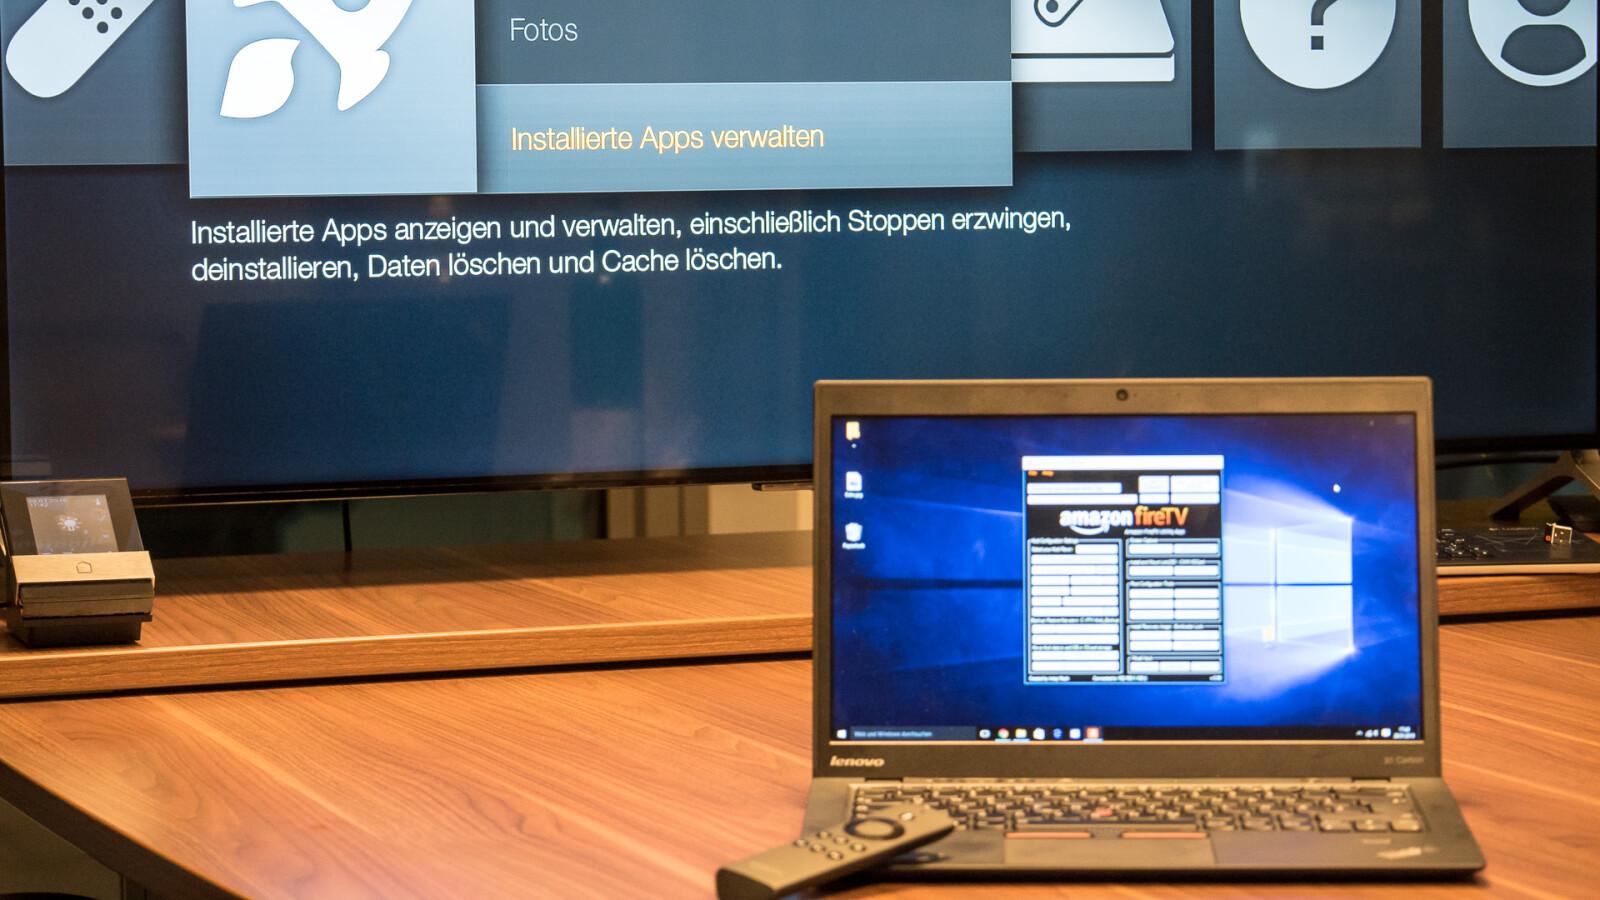 amazon fire tv android apps via windows pc installieren netzwelt